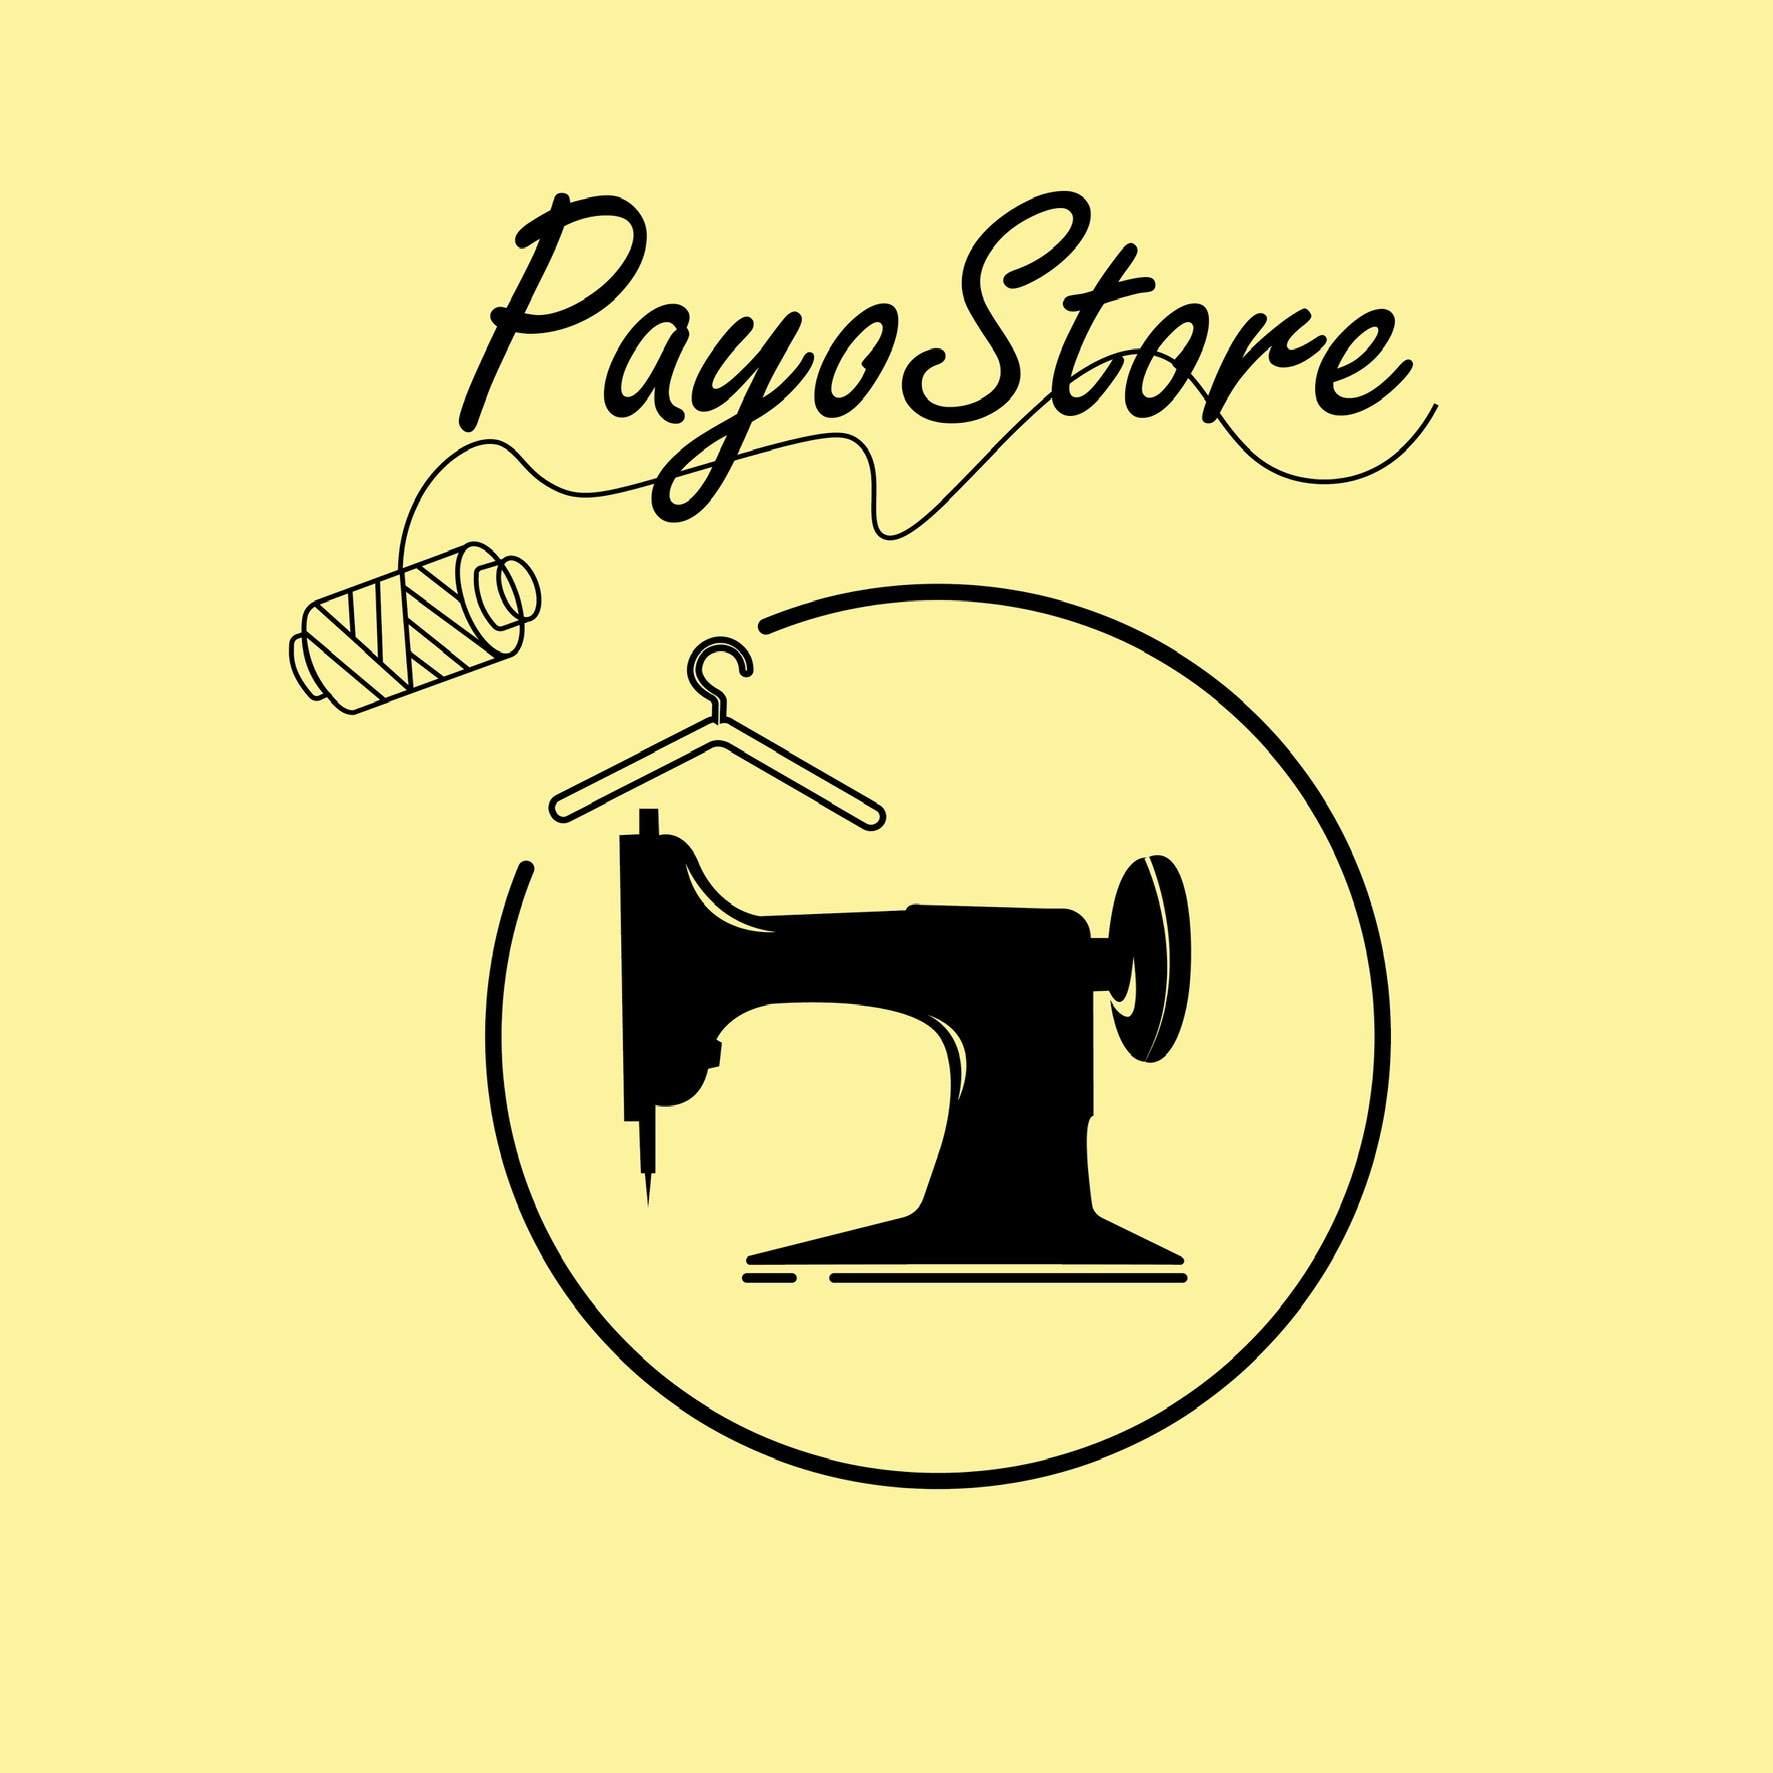 payostore